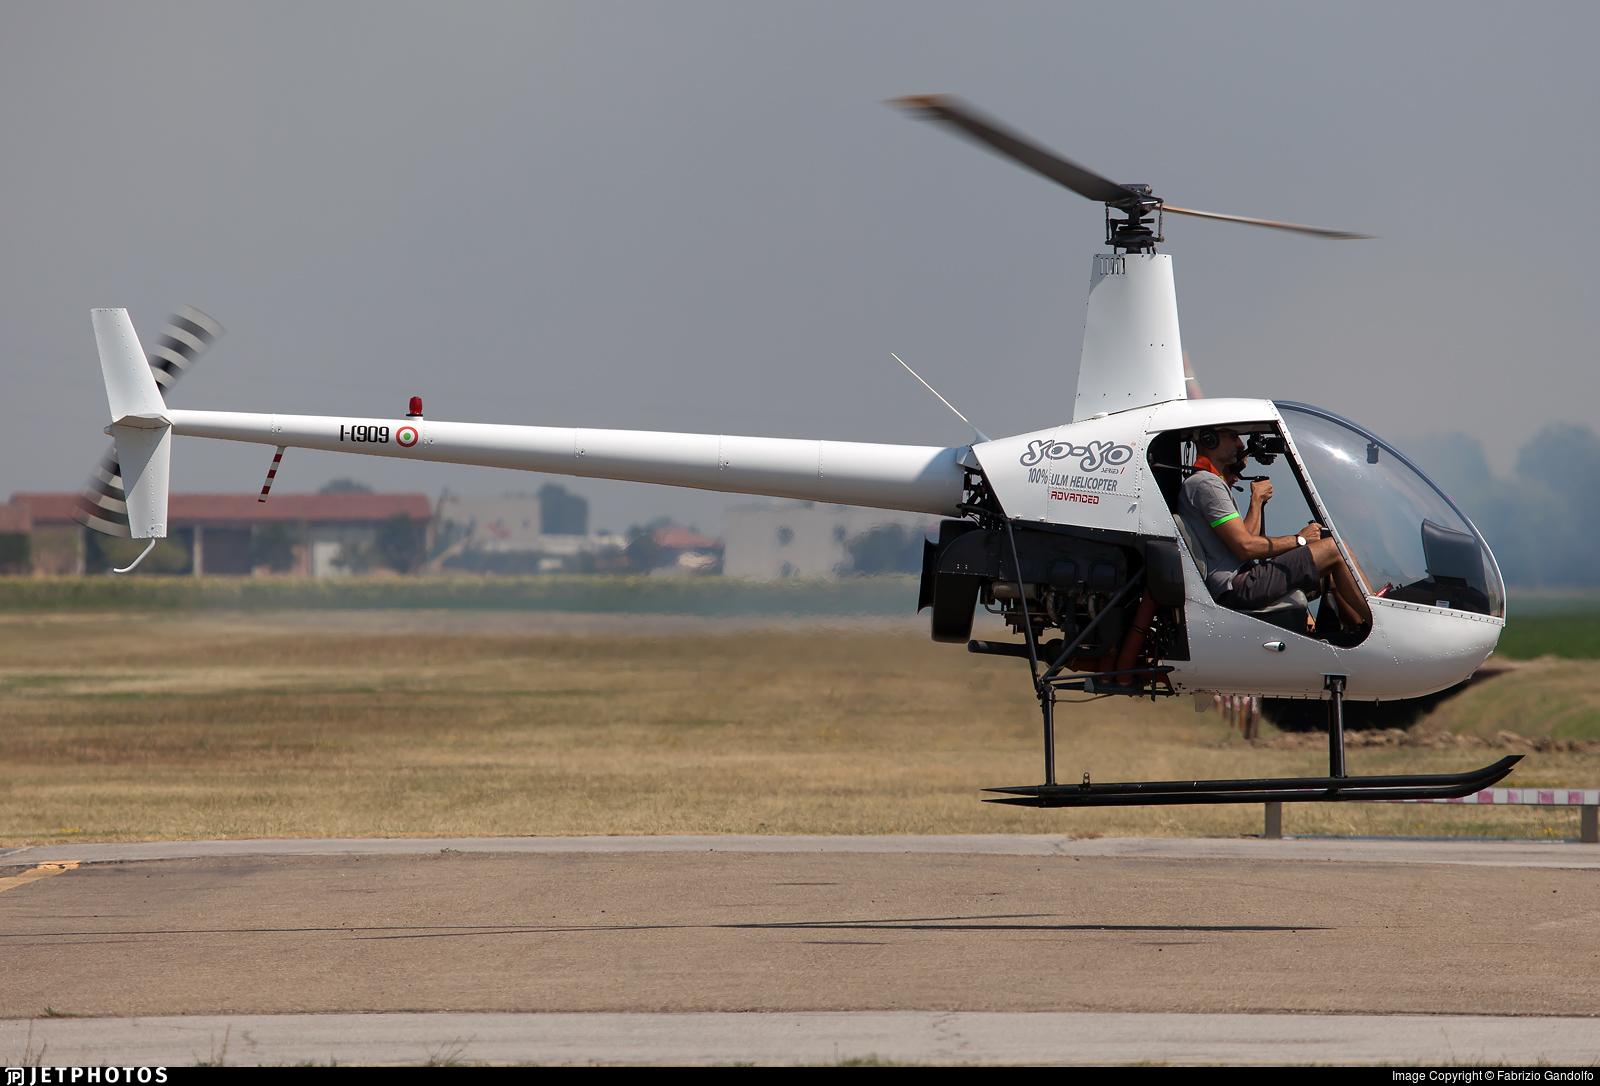 I-C909 - Yo-Yo Helicopter 222A - Private